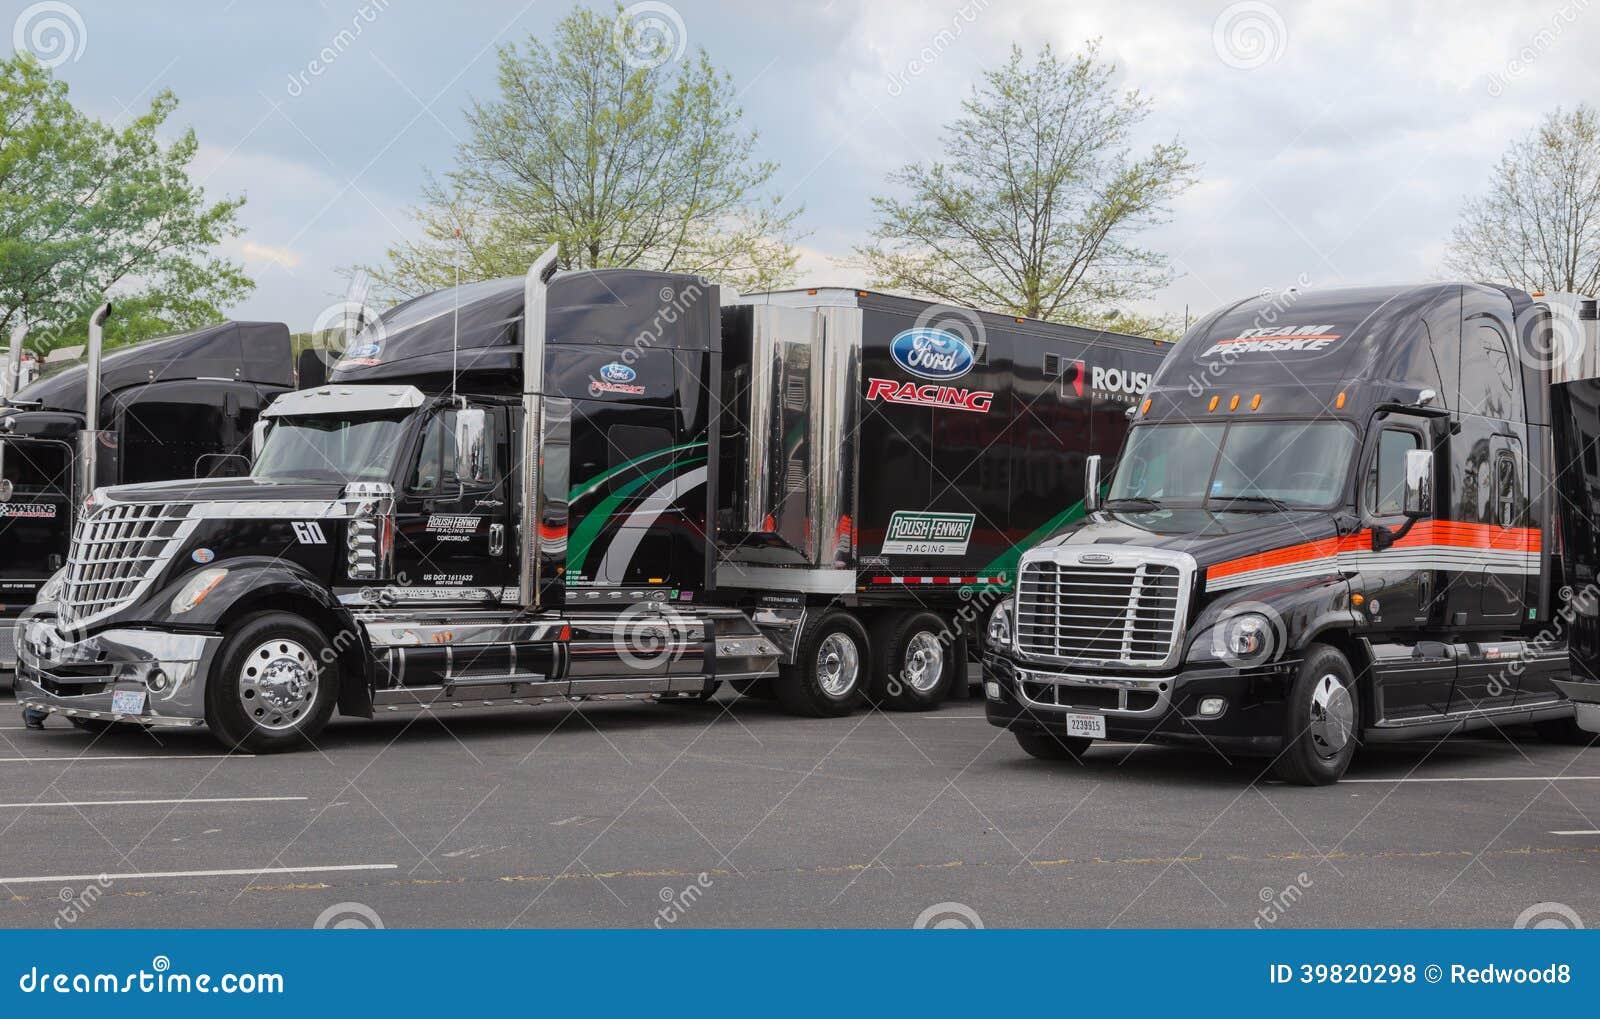 Roush Fenway Racing And Team Penske Nascar Haulers Editorial Stock